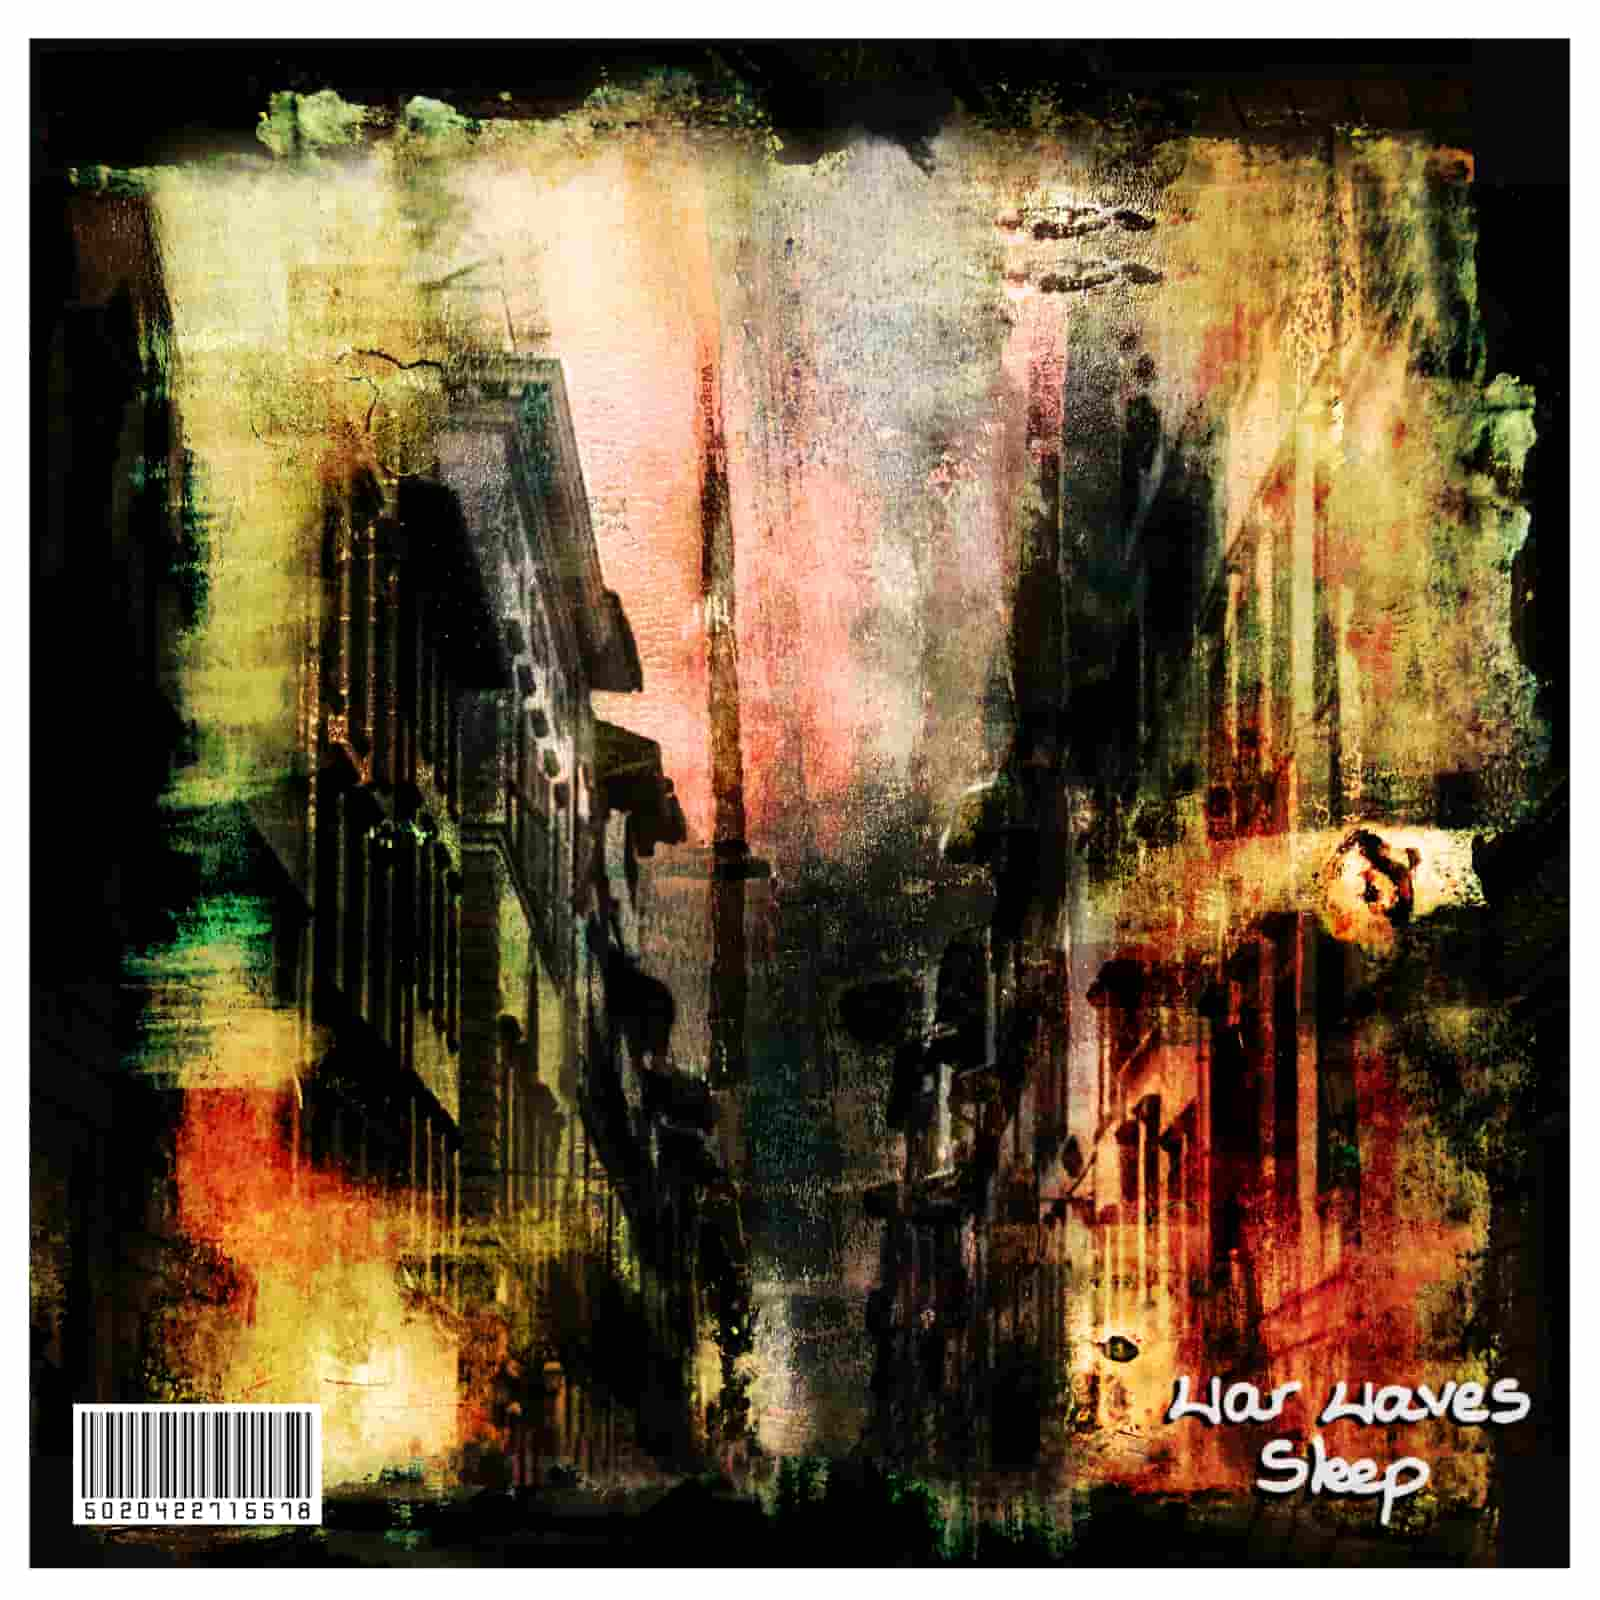 indie band War Waves new single Sleep